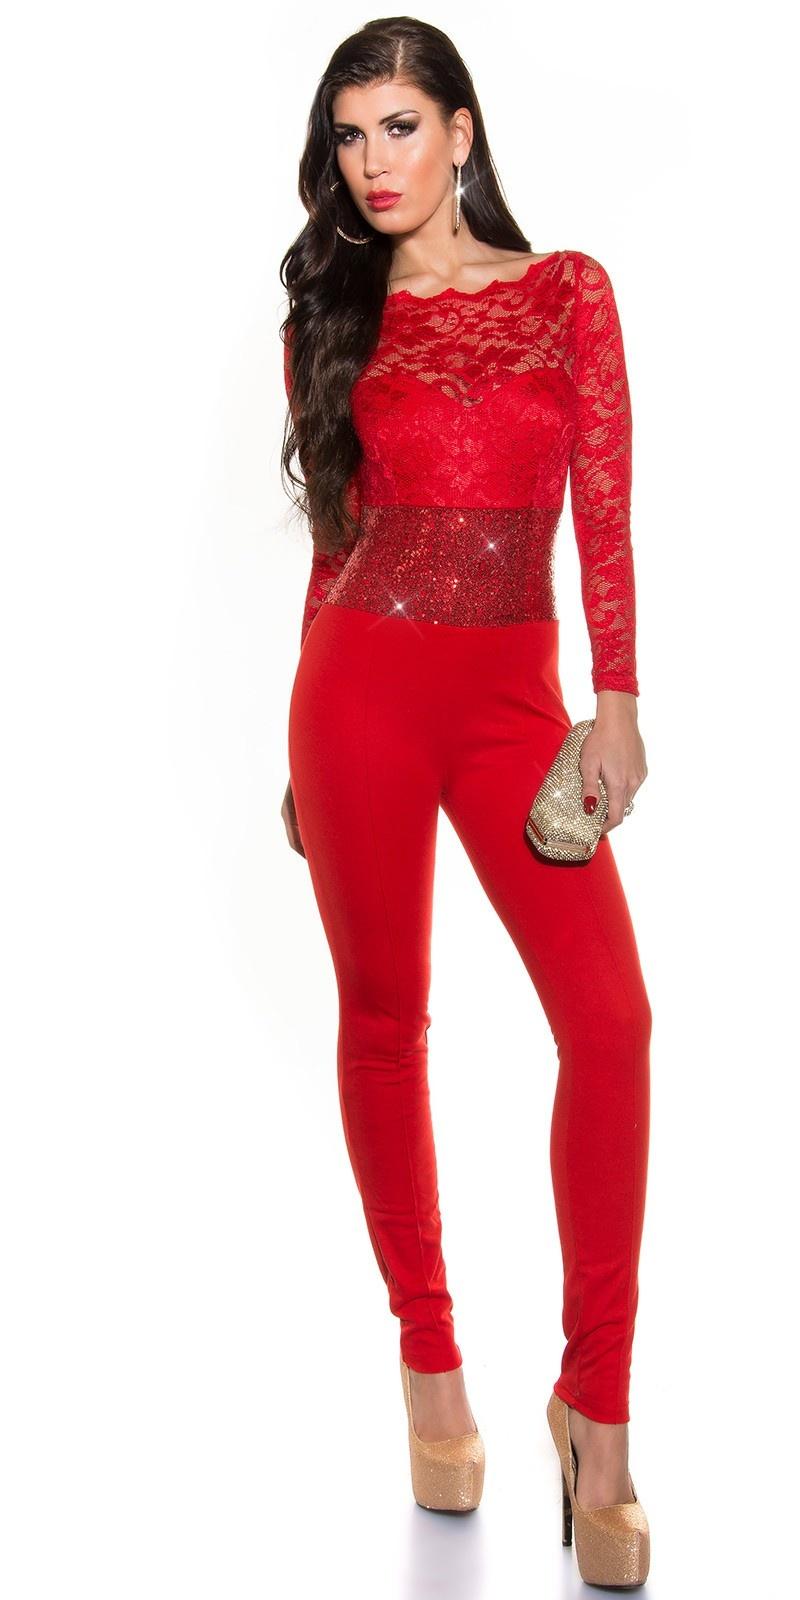 Party-jumpsuit met lange mouwen, kant en pailletten Rood